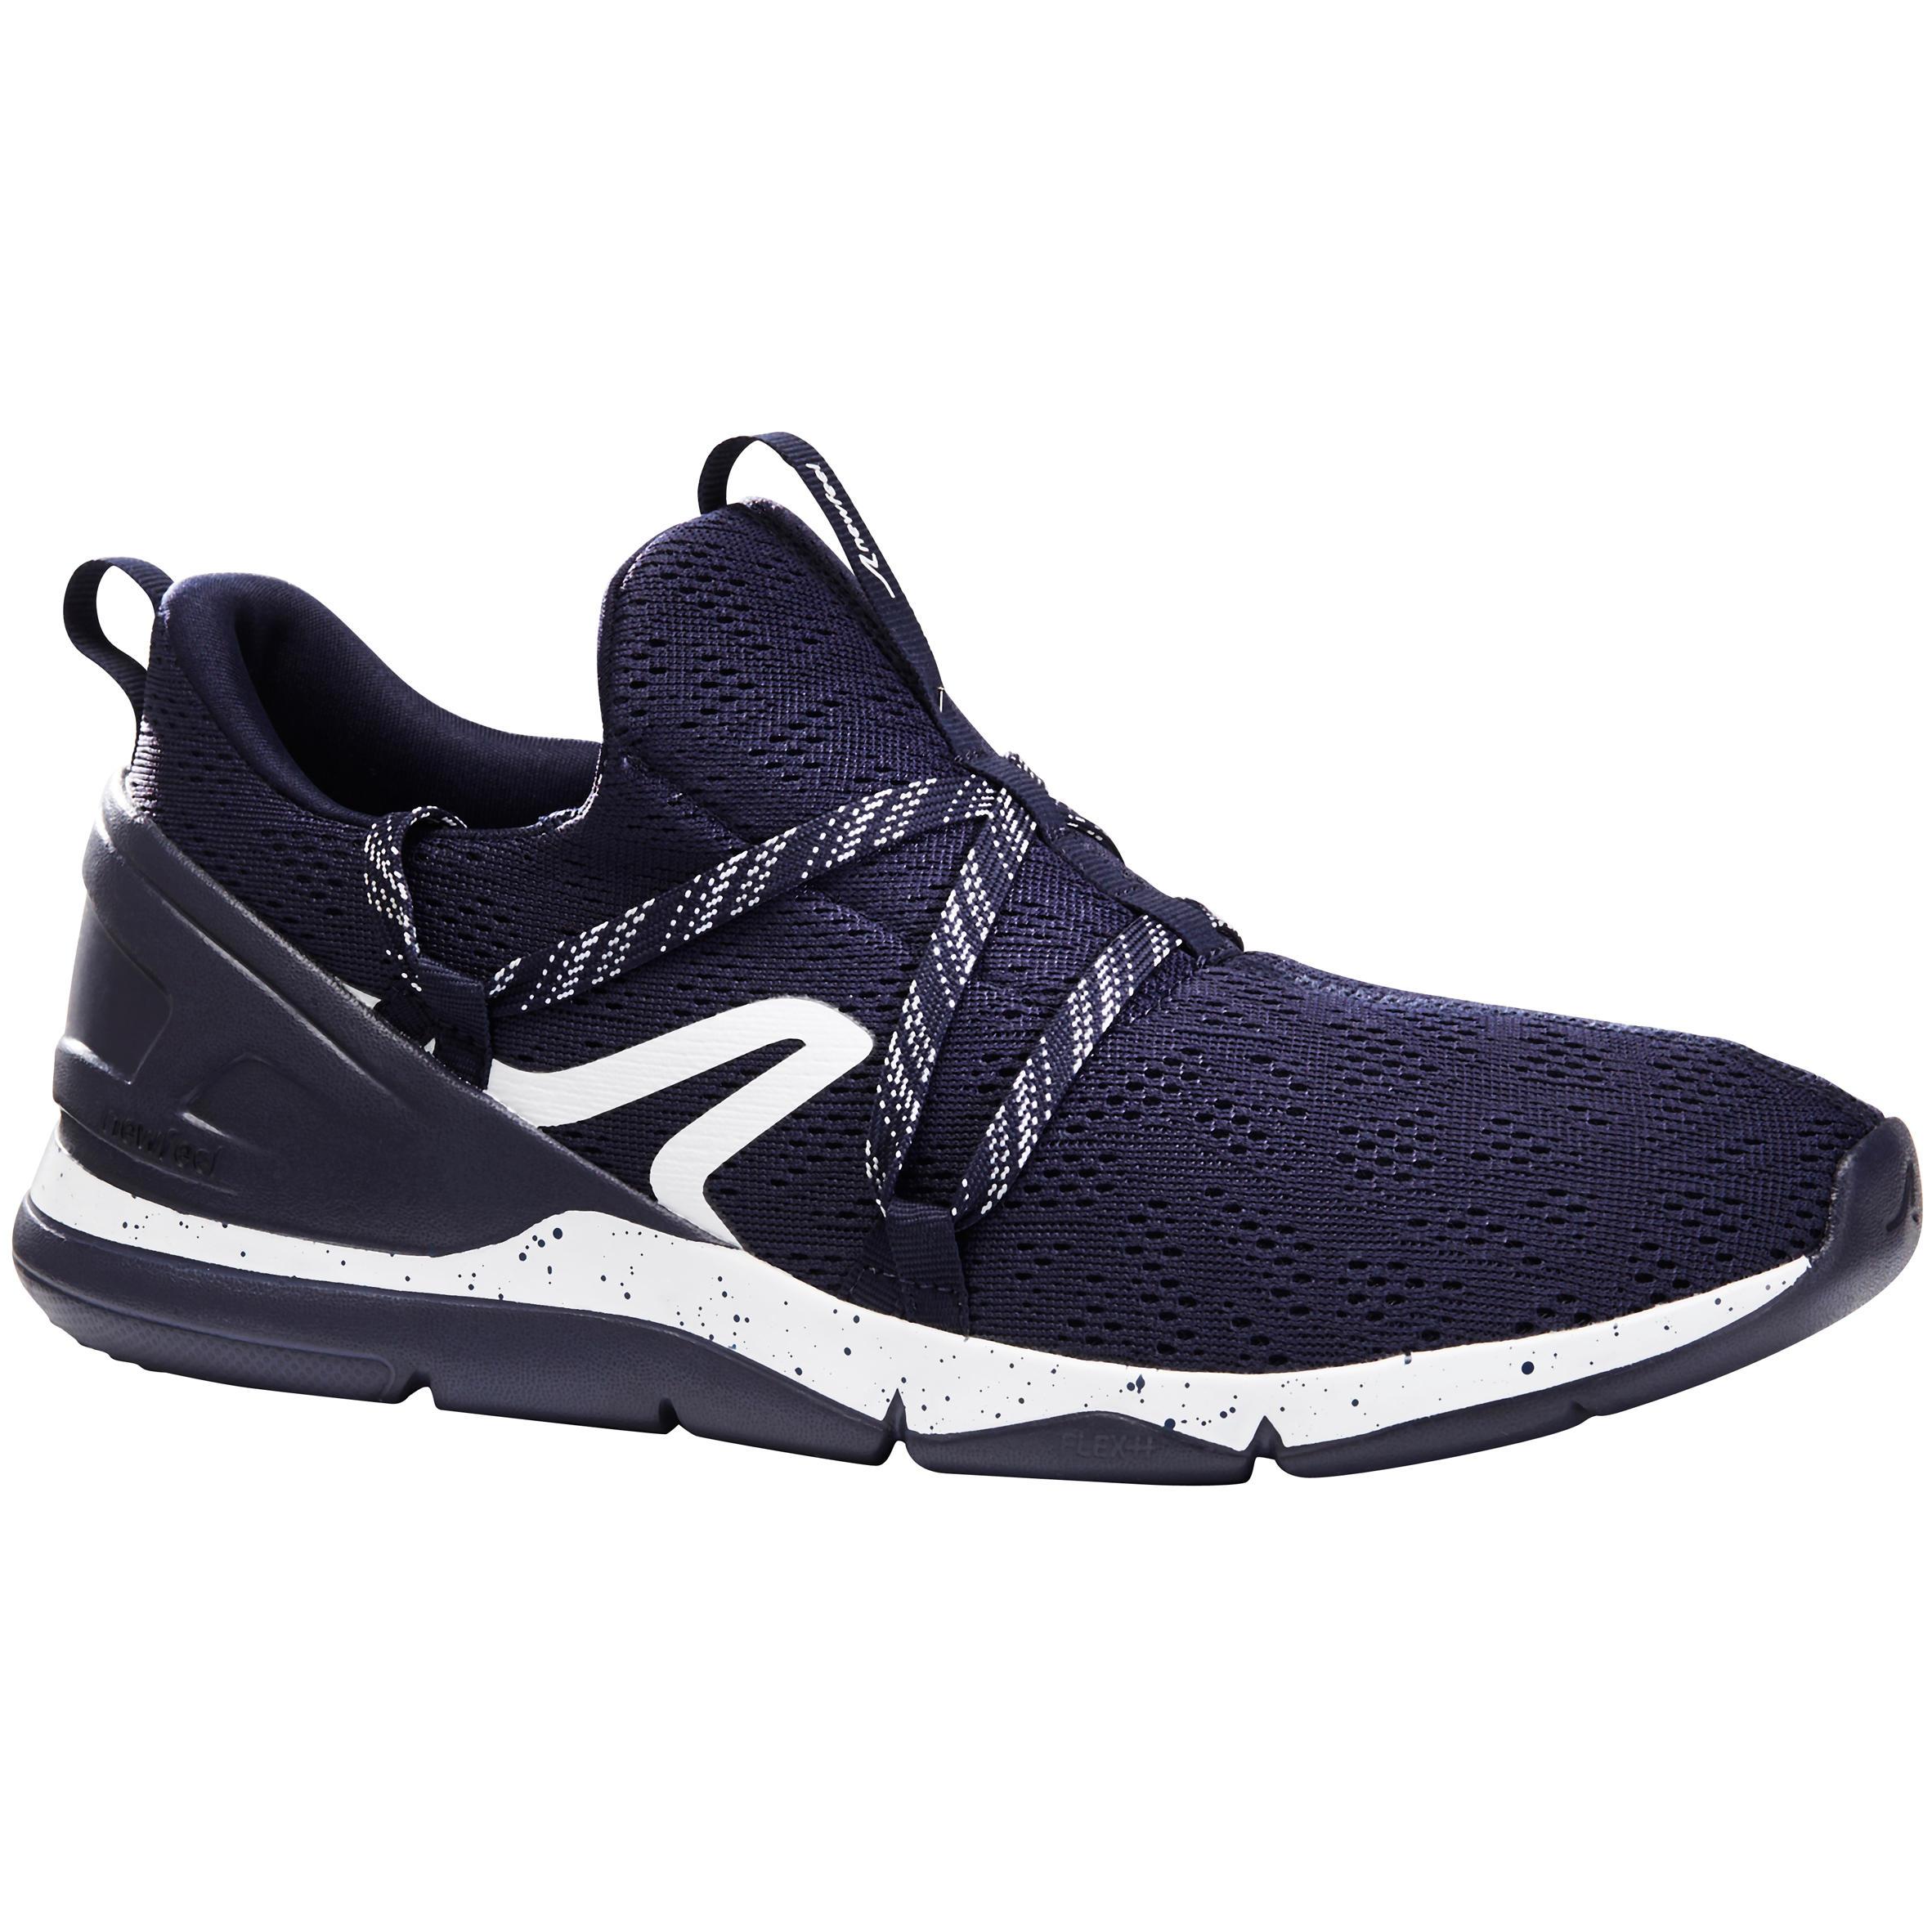 Newfeel Chaussures marche sportive homme PW 140 bleu / blanc - Newfeel